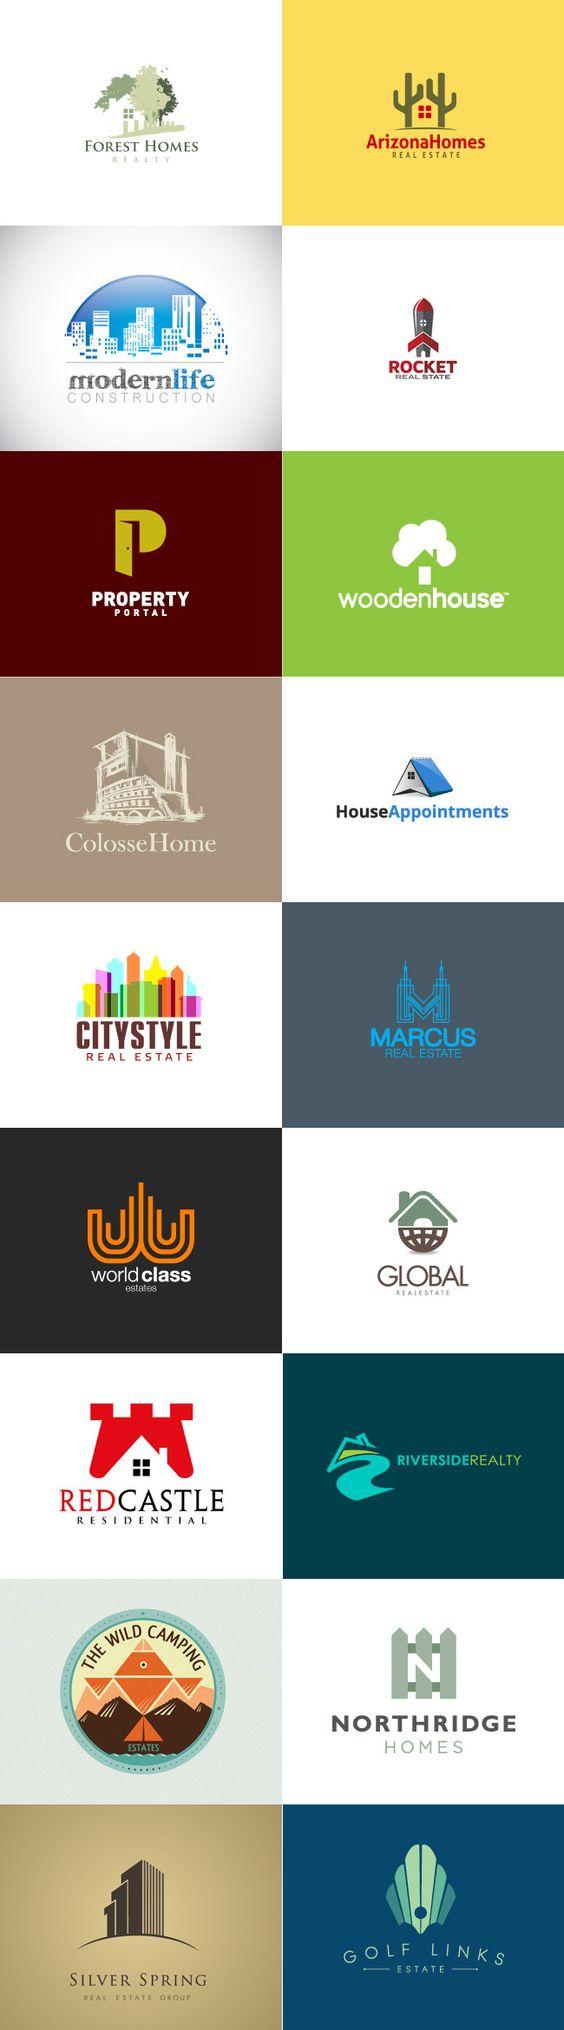 grafiker.de - Logo-Inspiration: Immobilien & Co.